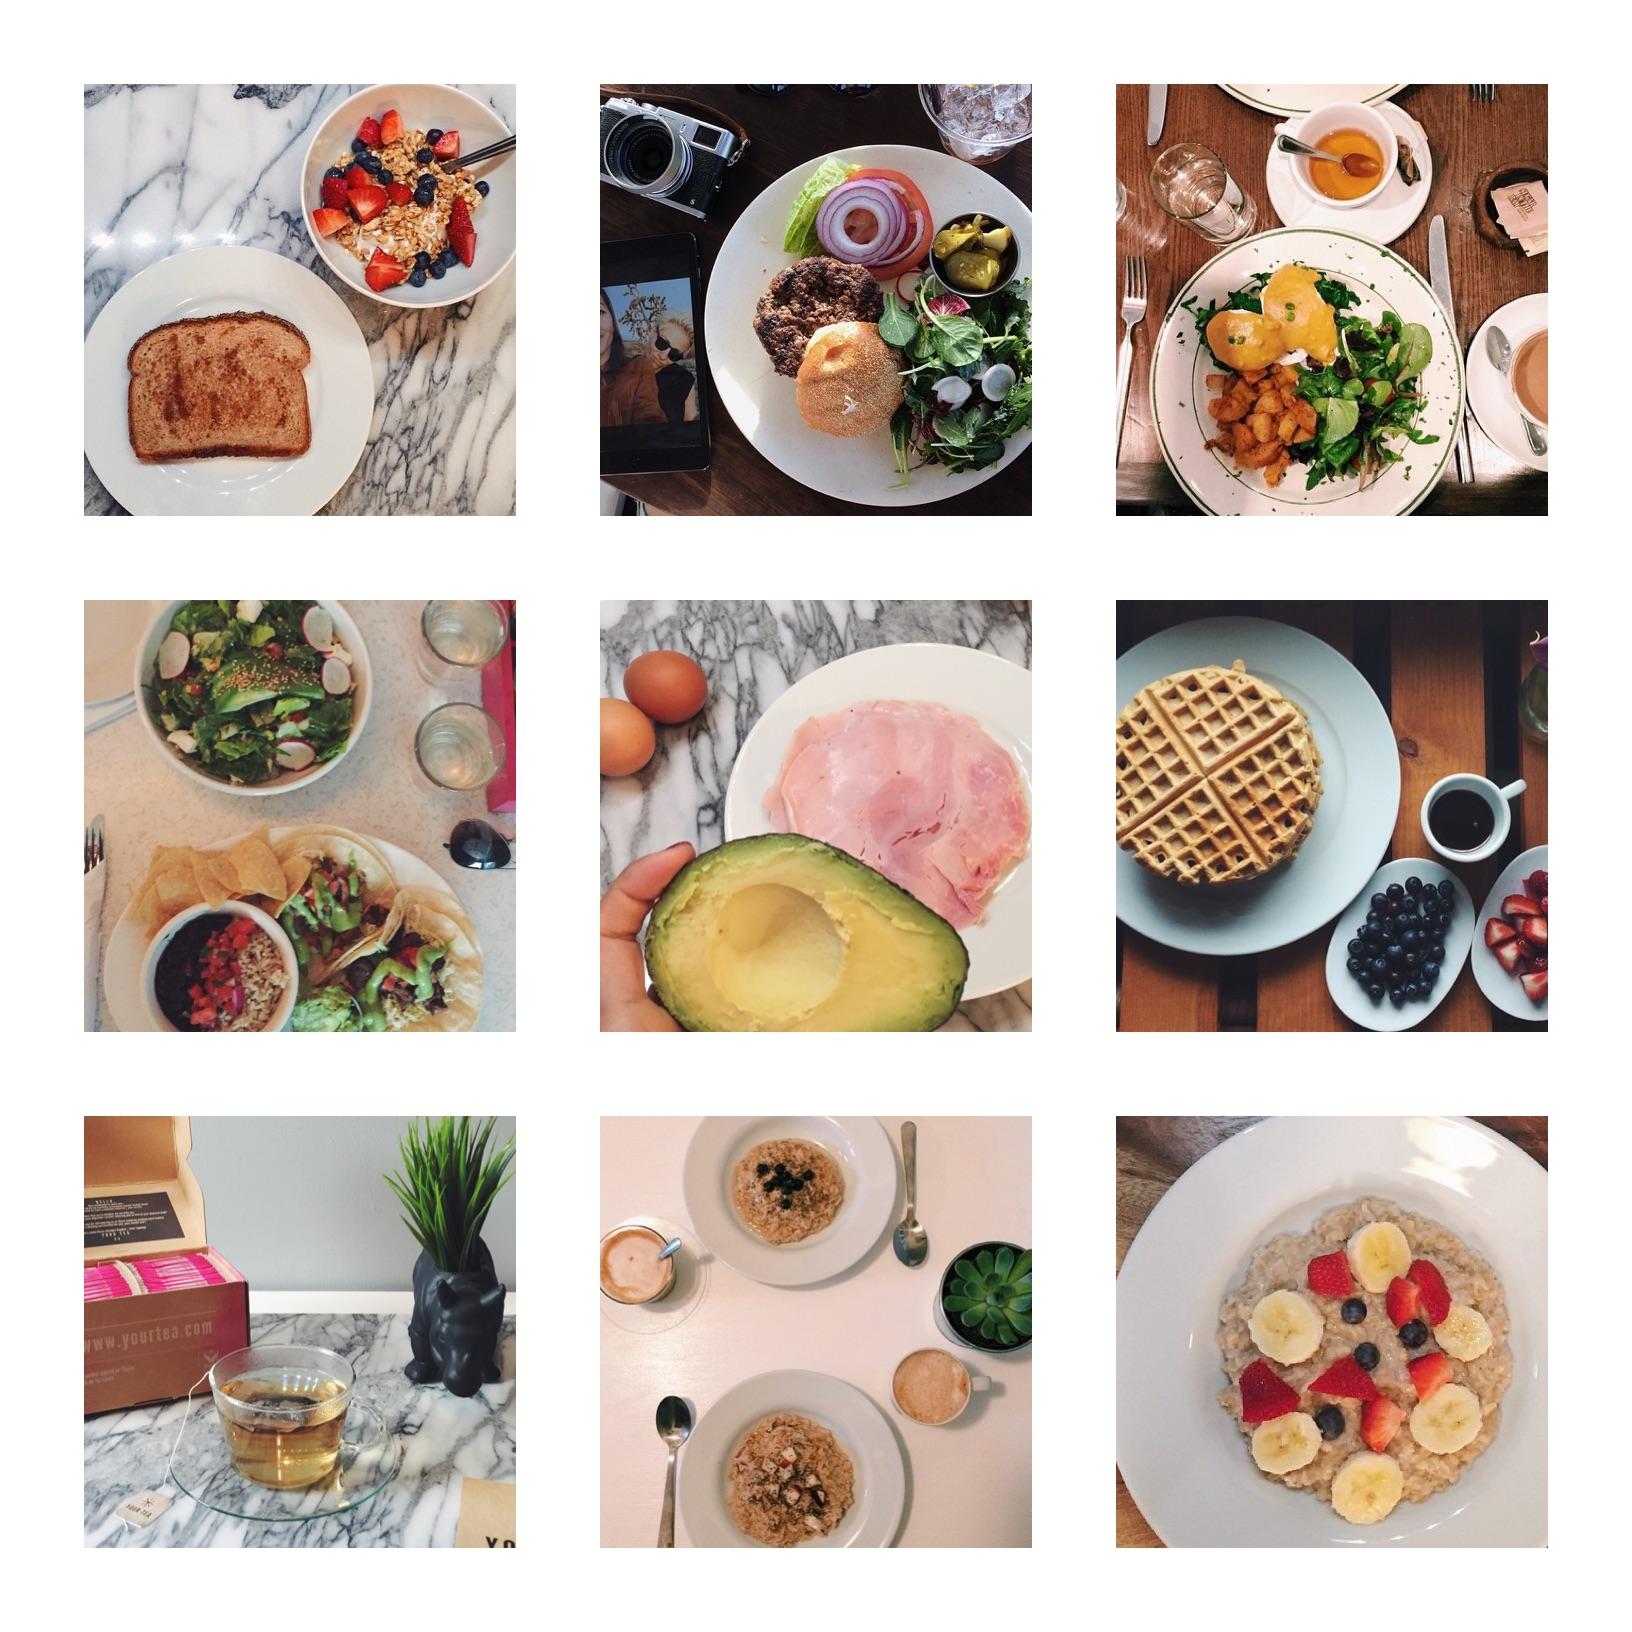 raquel_paiva_fashion_blogger_food_instagram